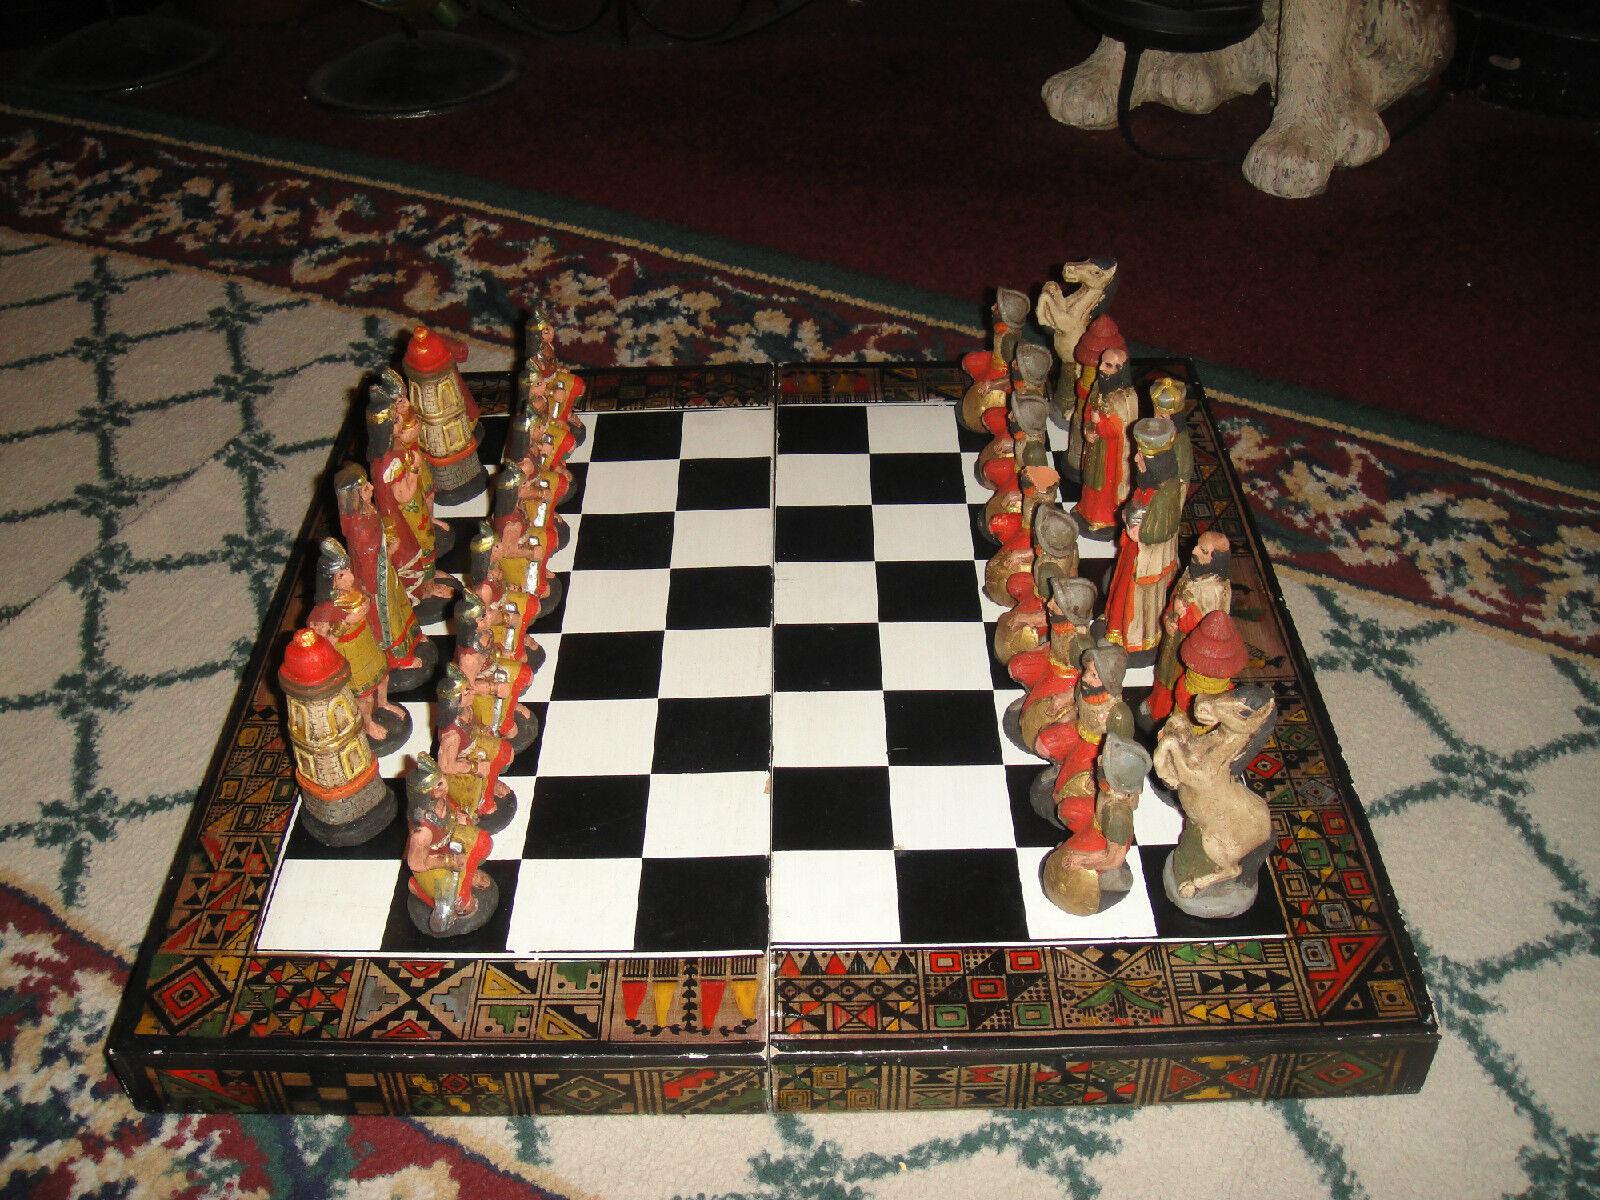 Vintage cruzadas Ajedrez set-christians & muslims-wood board-chalkware Pottery